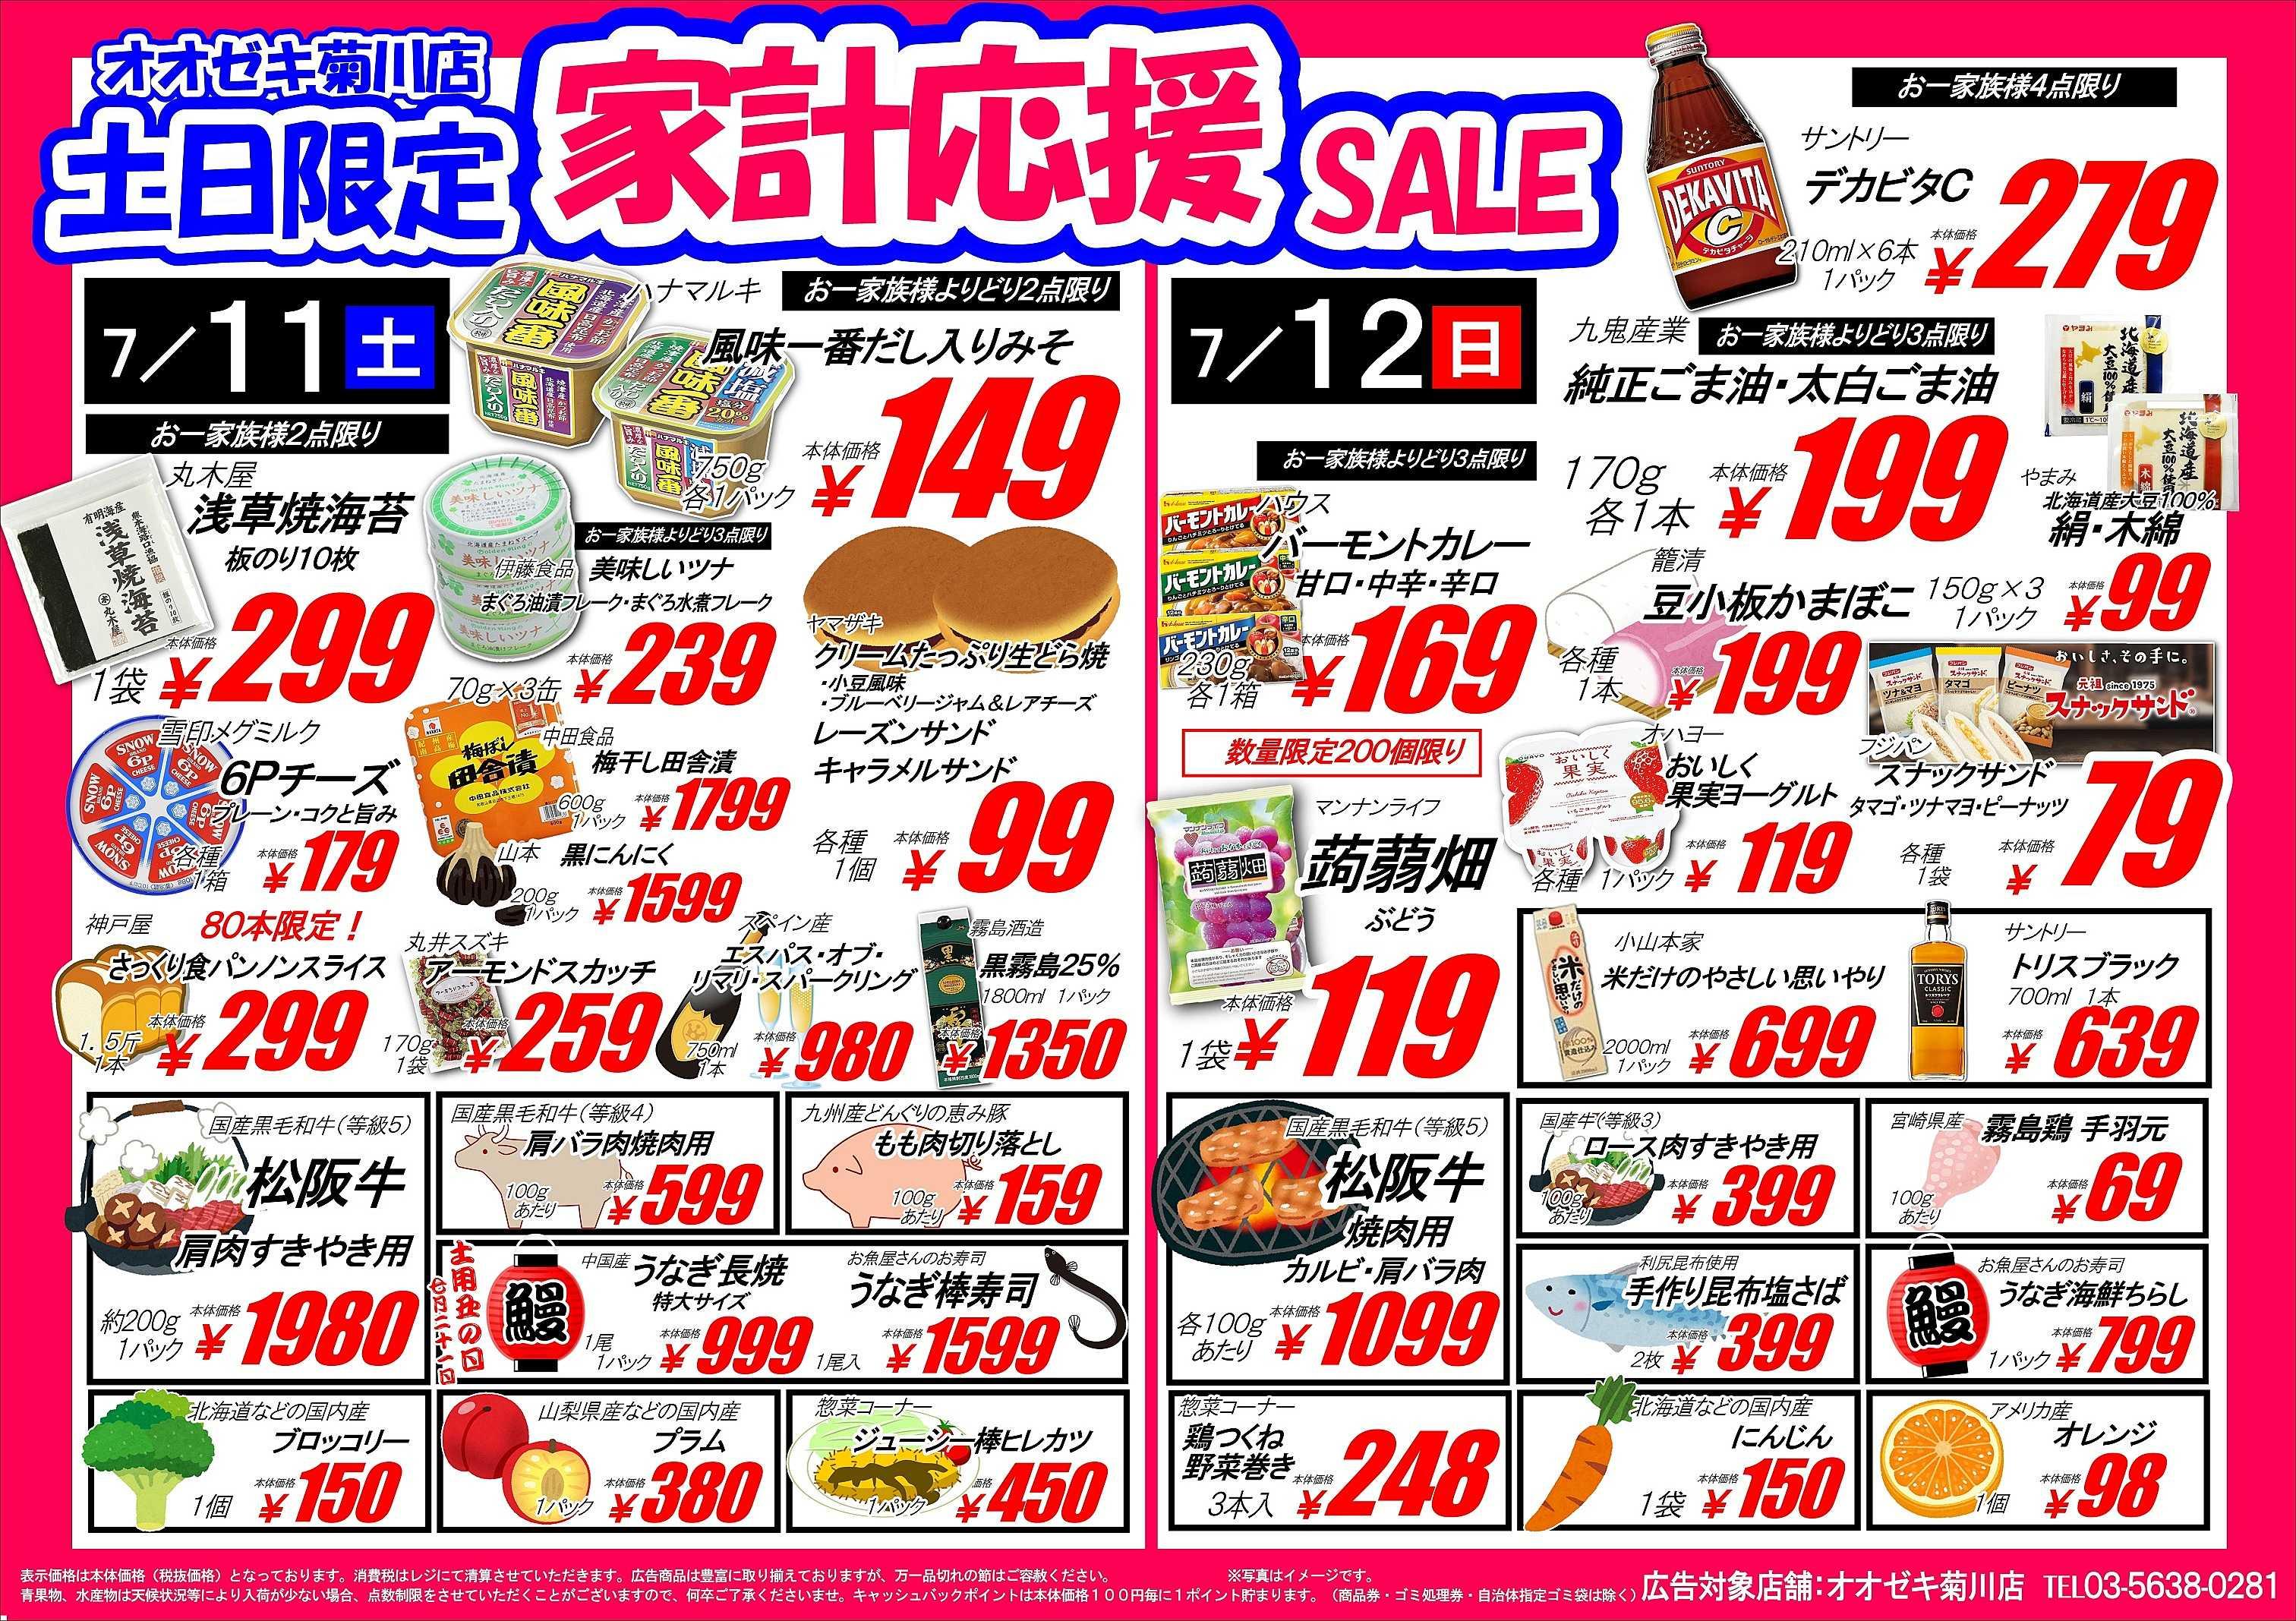 オオゼキ 【菊川店】7/11(土)7/12(日)家計応援SALE